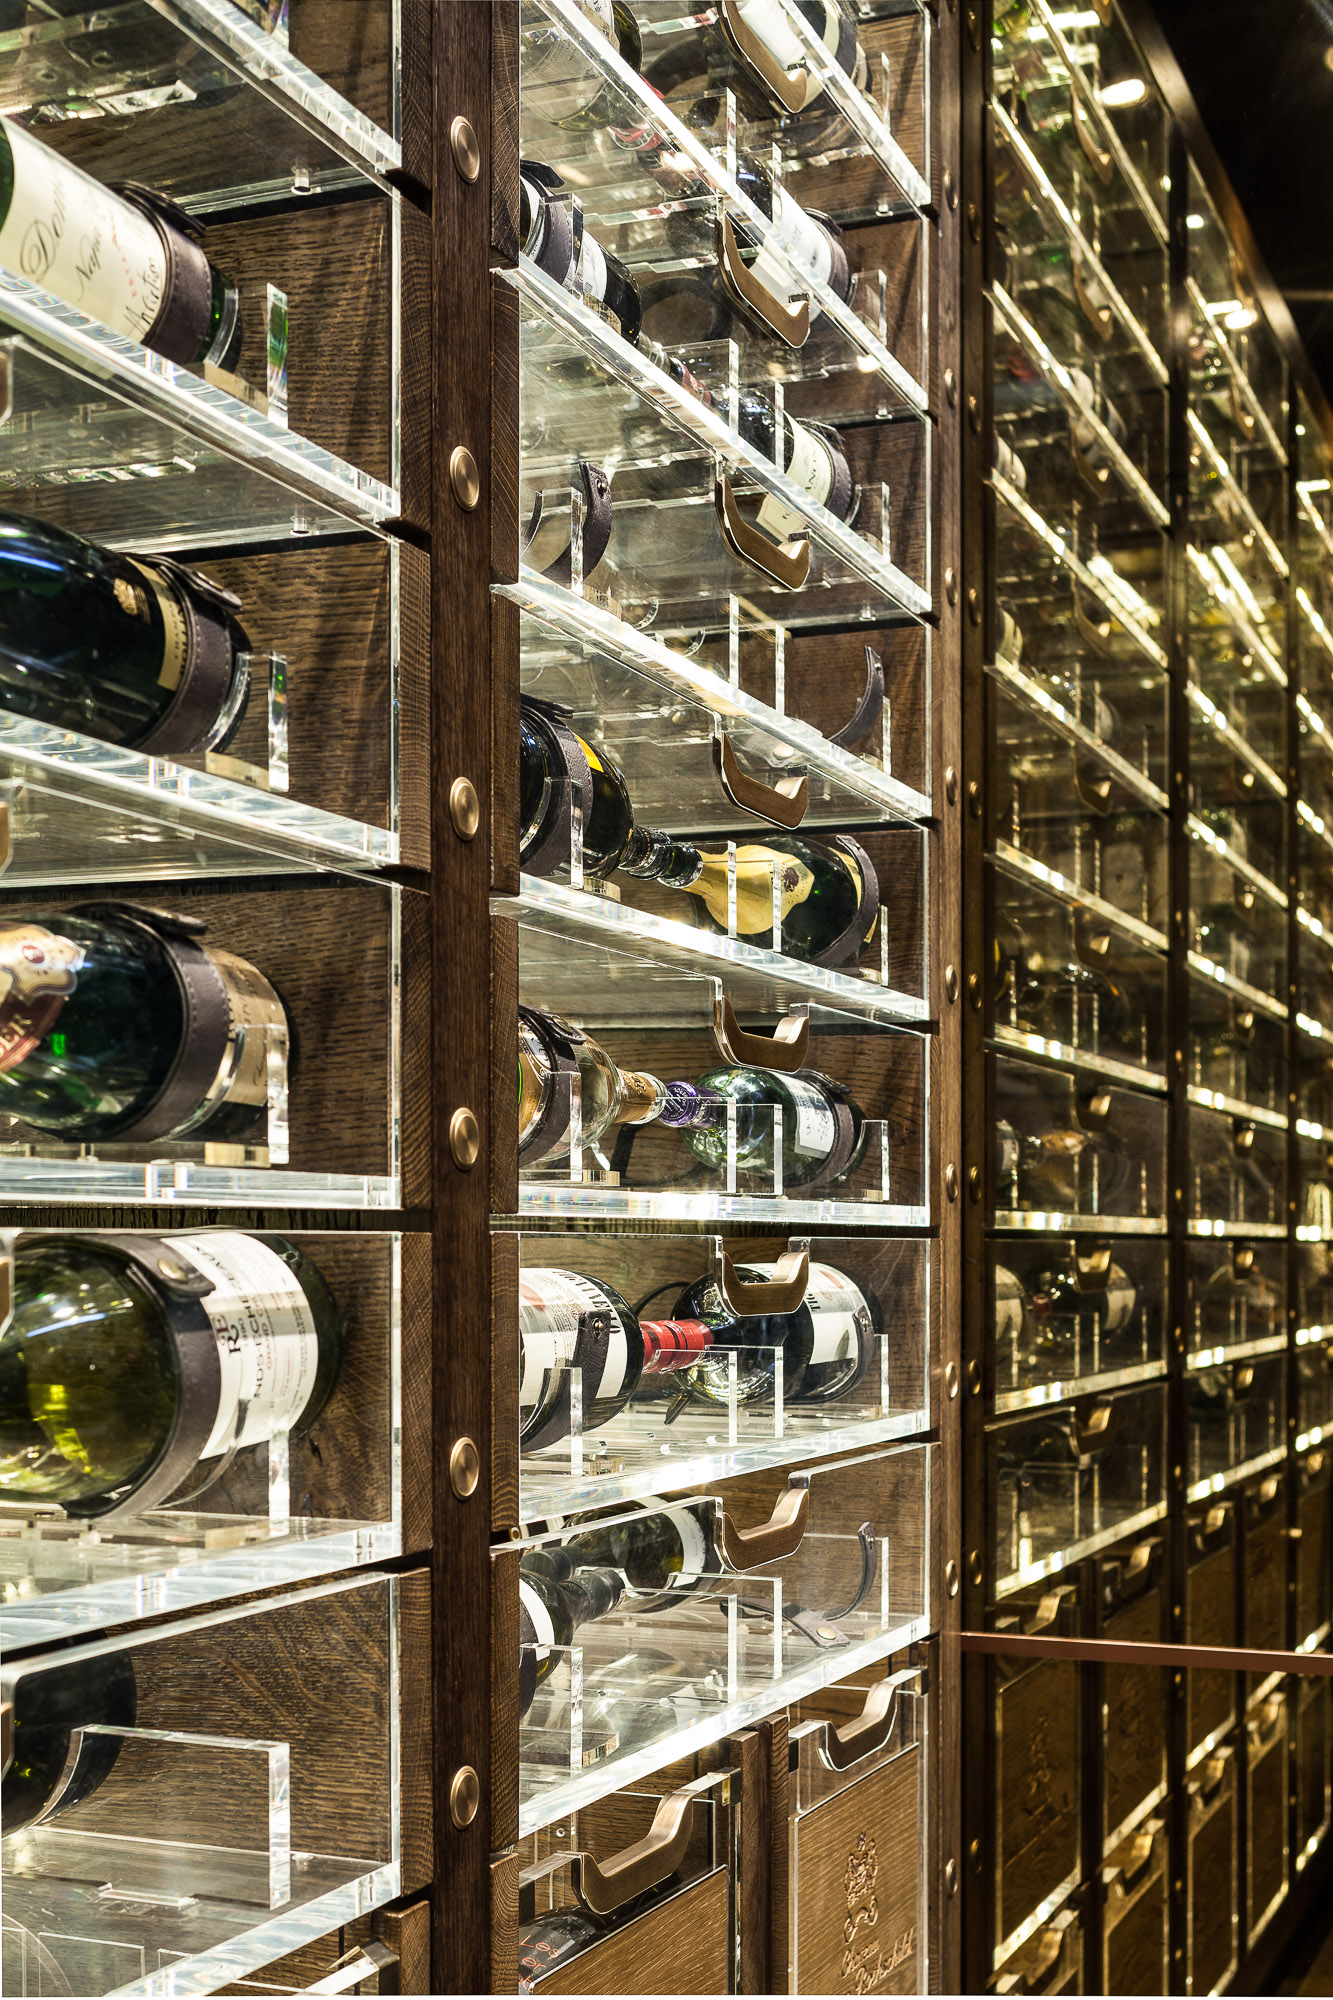 20170313_yacht_wine_cellar_0153.jpg